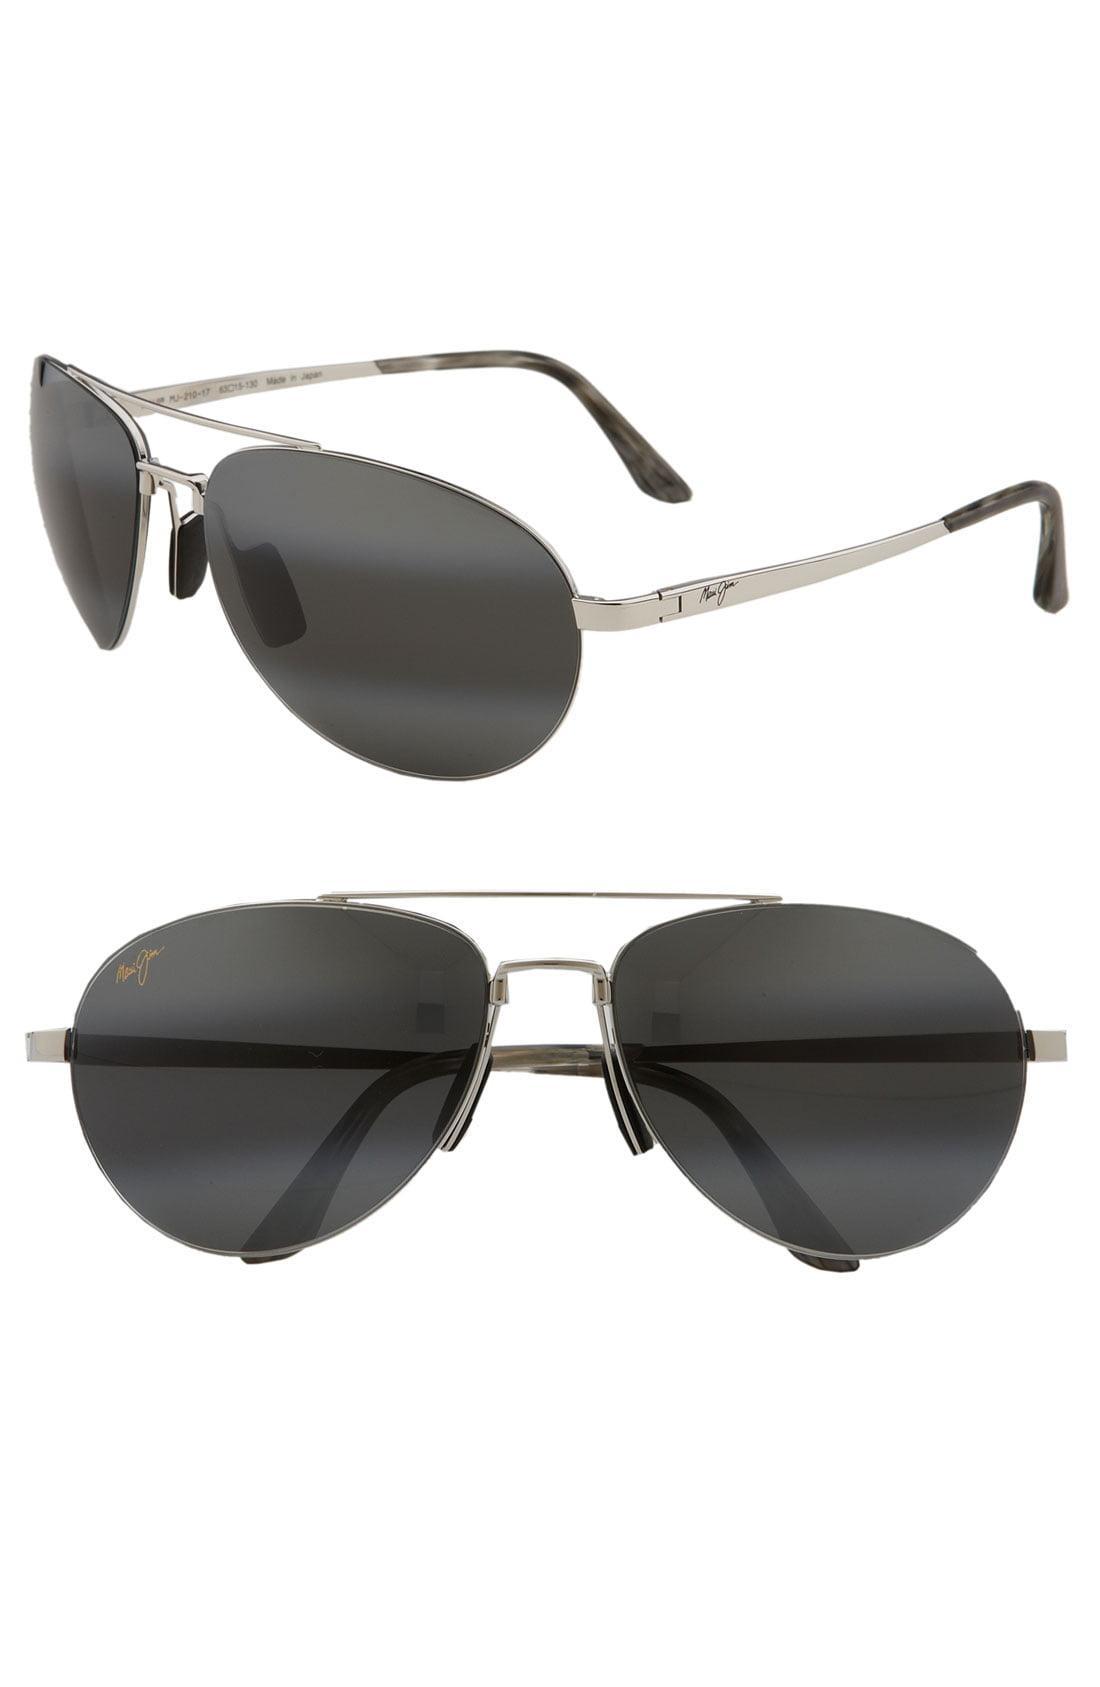 ea3a12ced3 Lyst - Maui Jim  pilot - Polarizedplus2  63mm Sunglasses in Metallic ...